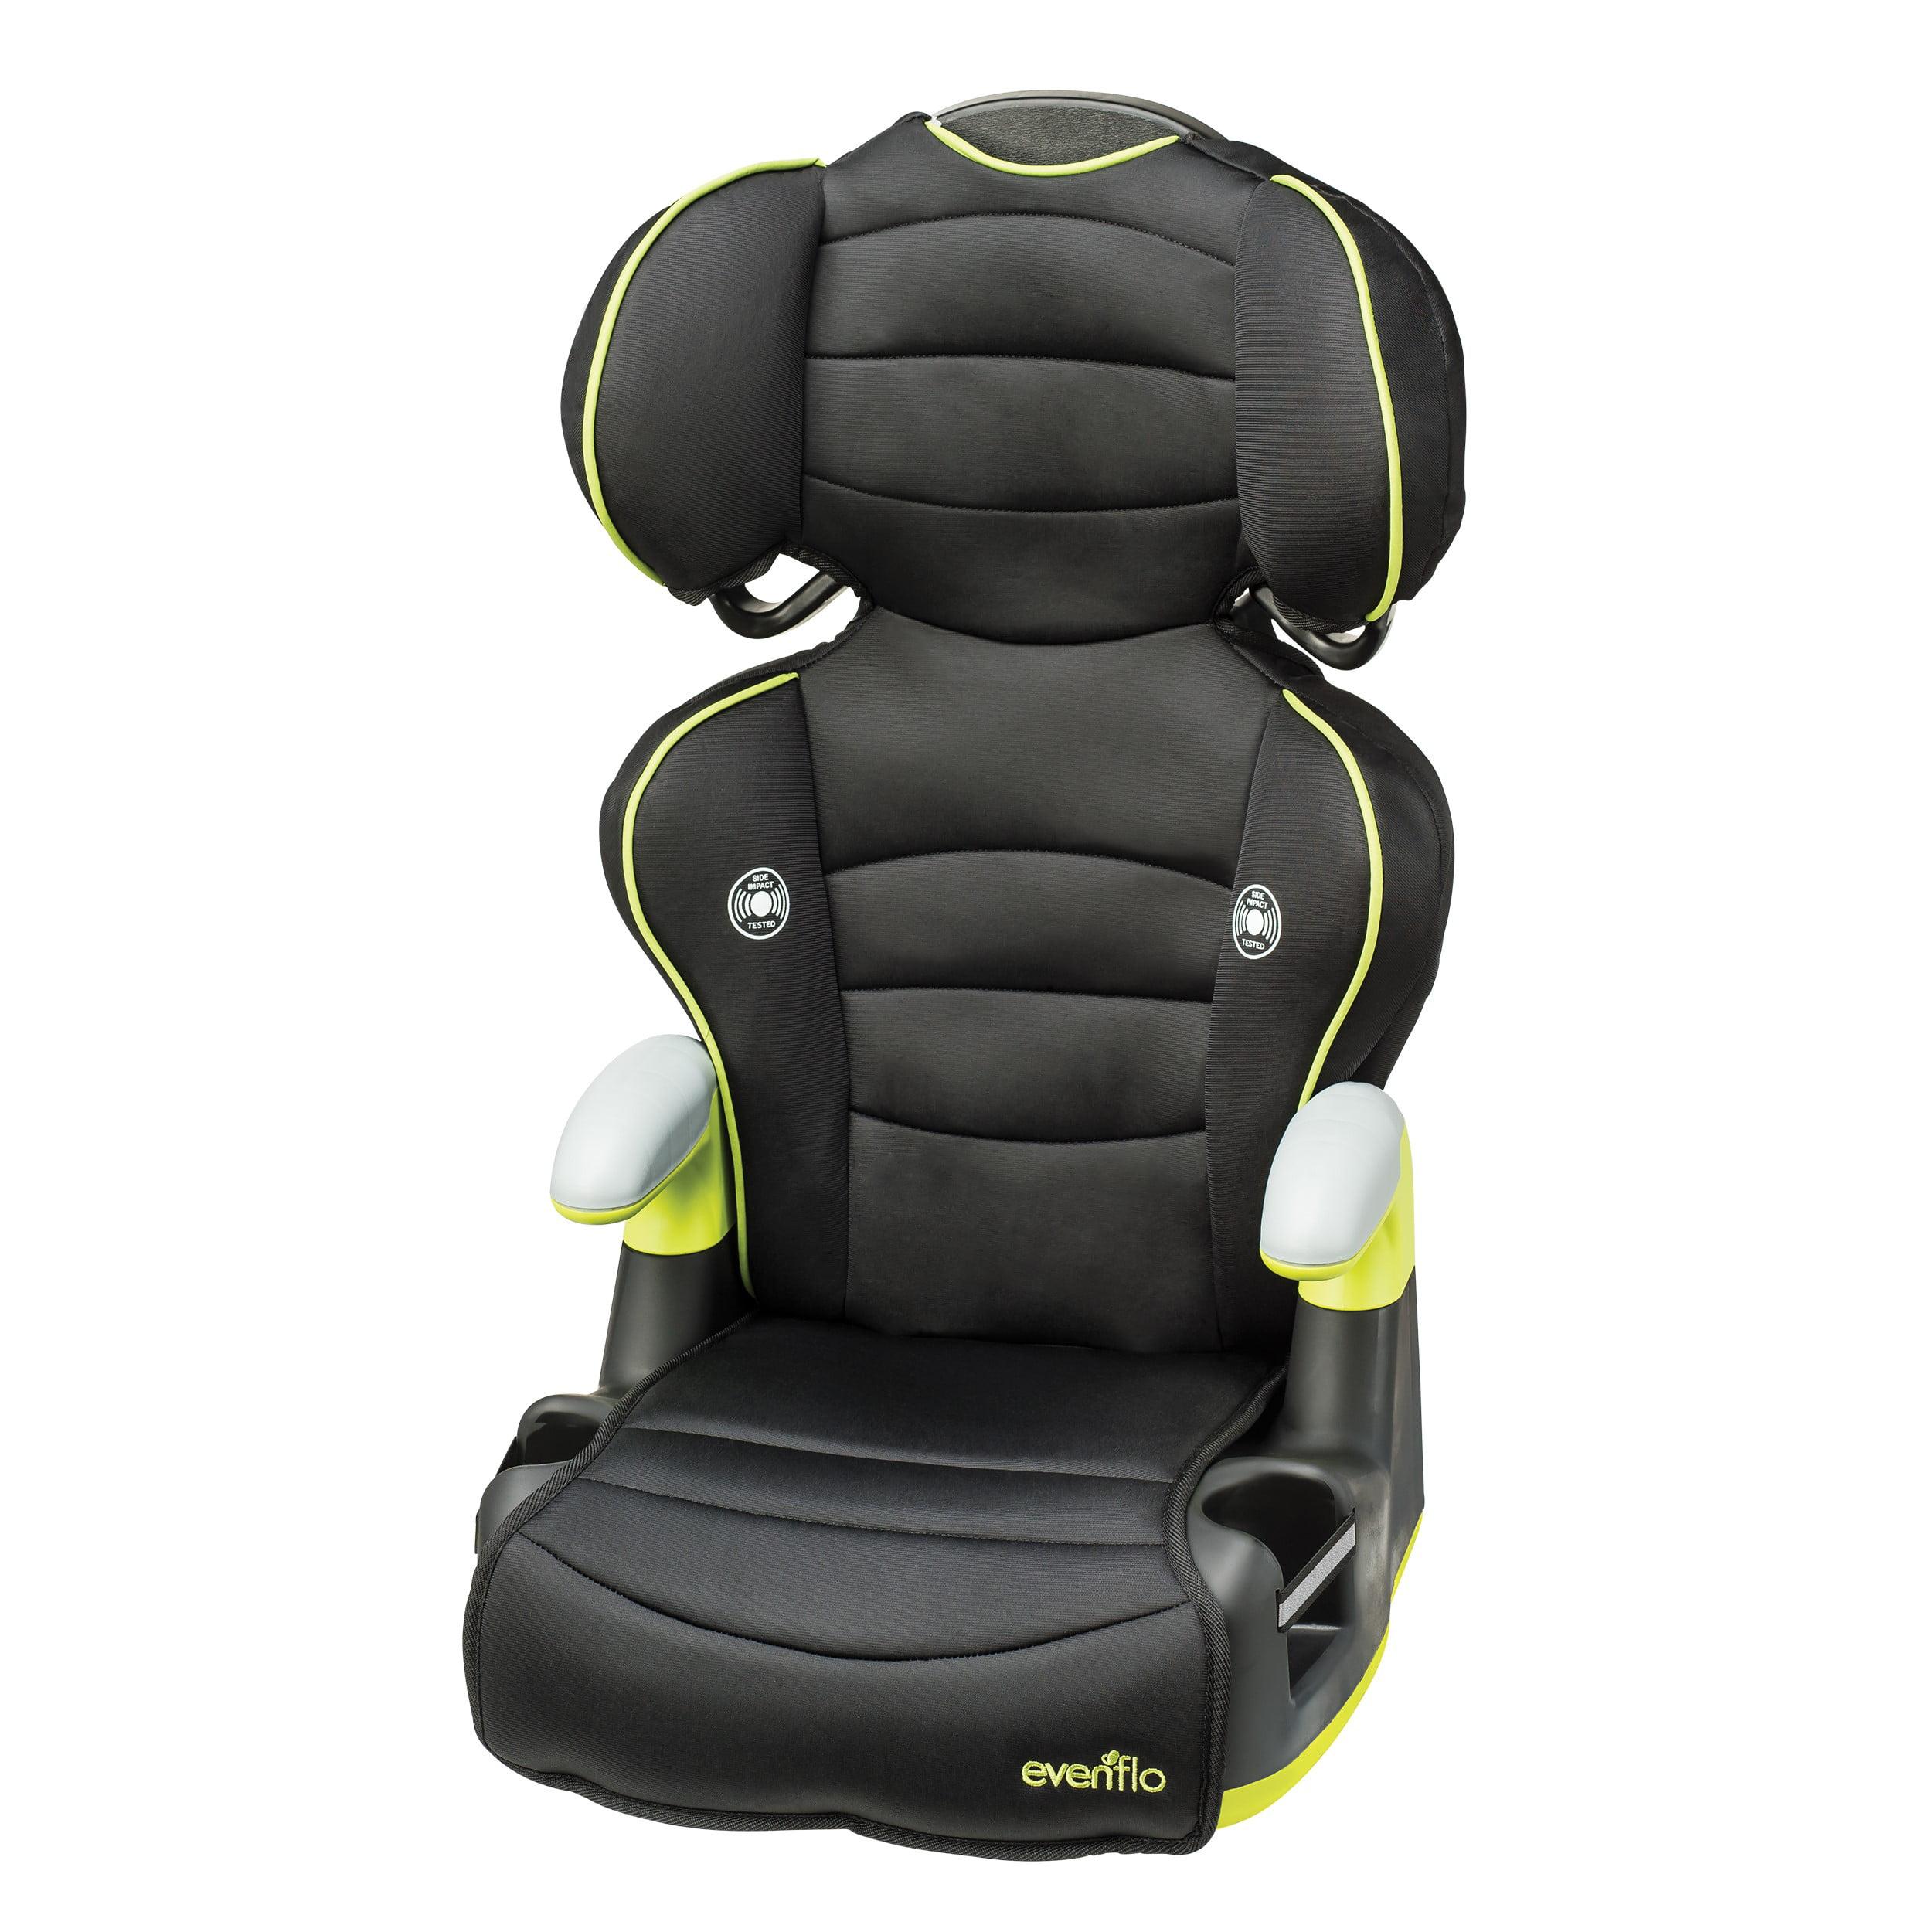 Evenflo Big Kid High Back Booster Car Seat, Naperville